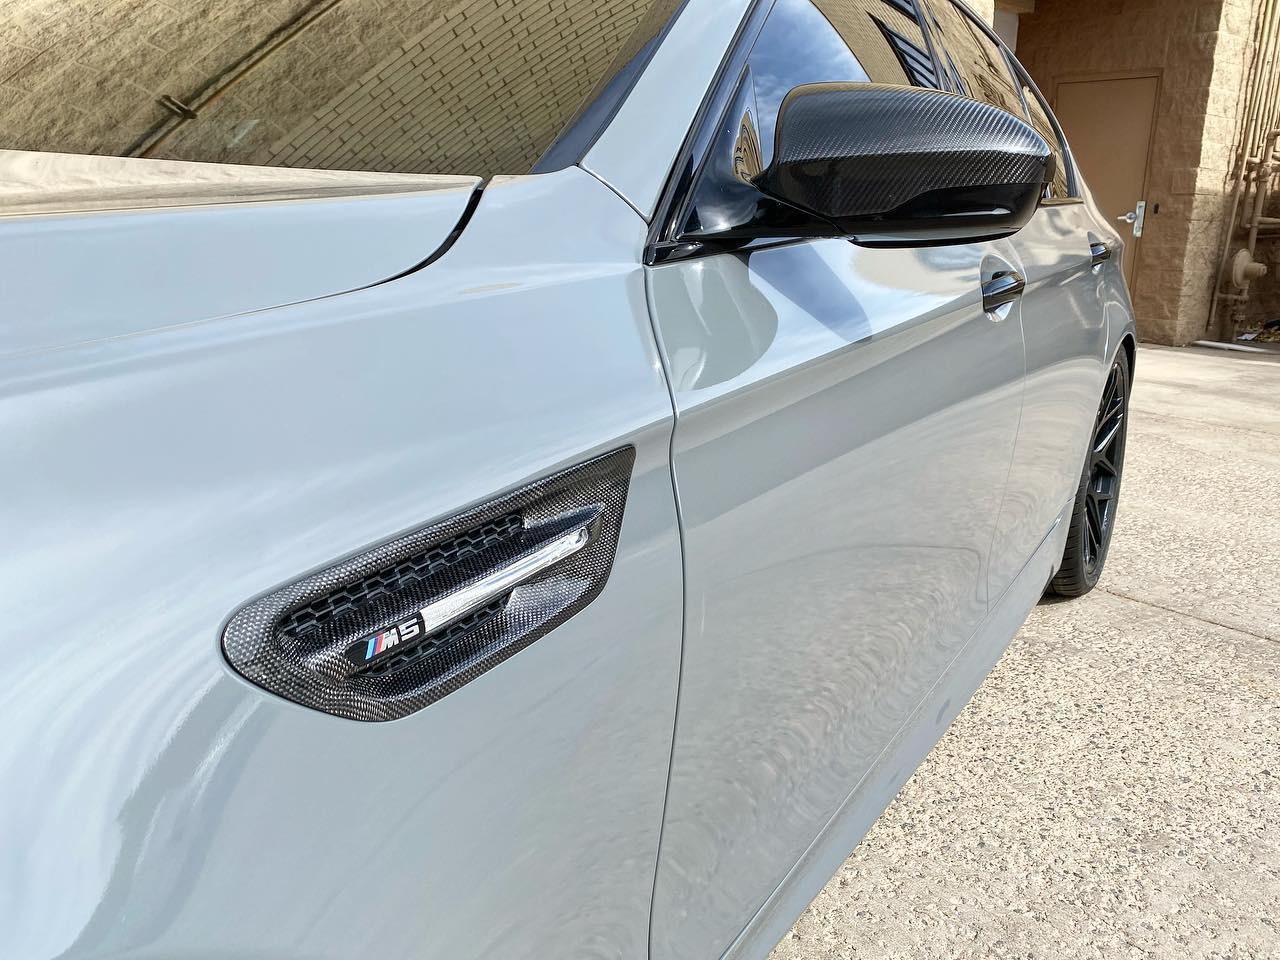 BMW M5 window tinting side view